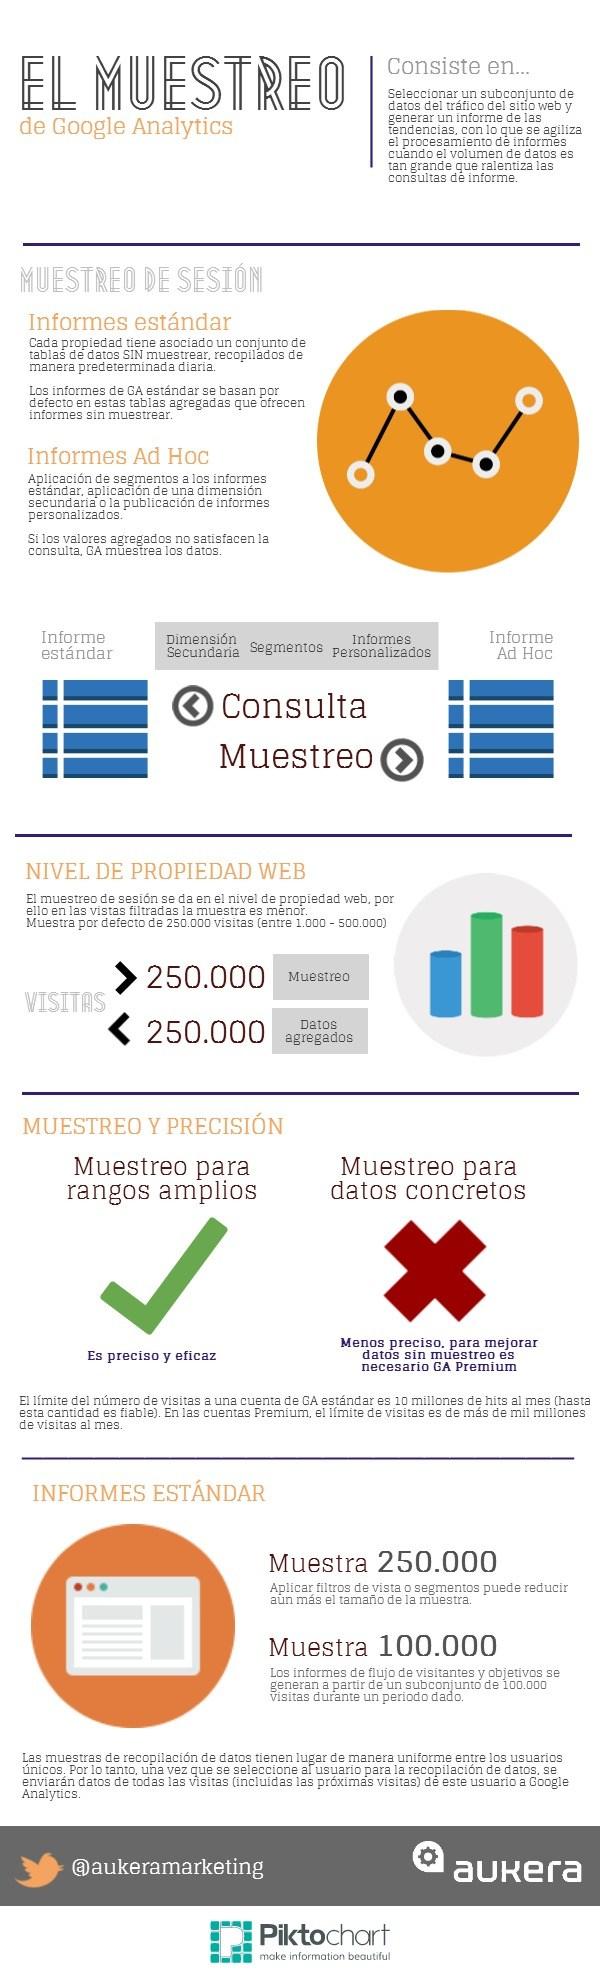 El muestreo de Google Analytics